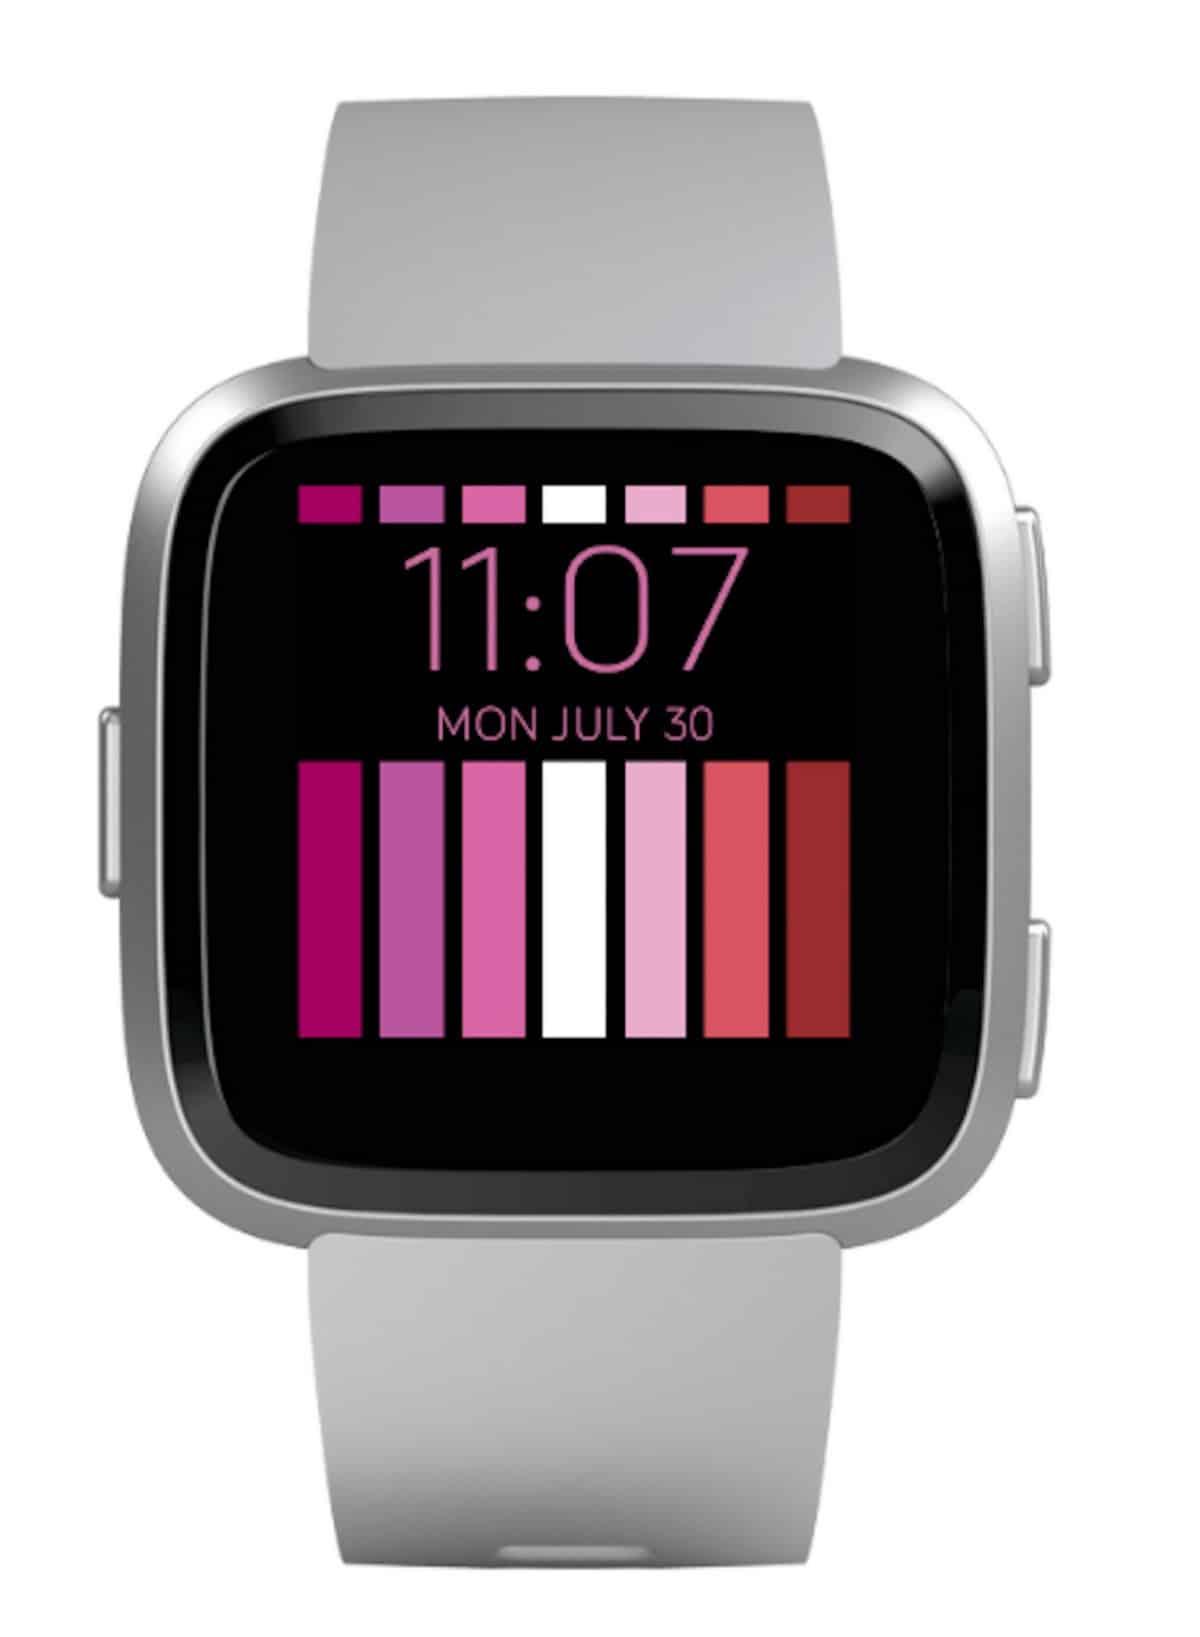 Fitbit Fitforpride Clockface2 - #FitForPride ฟิตบิทเพิ่มหน้าปัด Pride เฉลิมฉลอง Pride Month ของชาว LGBT